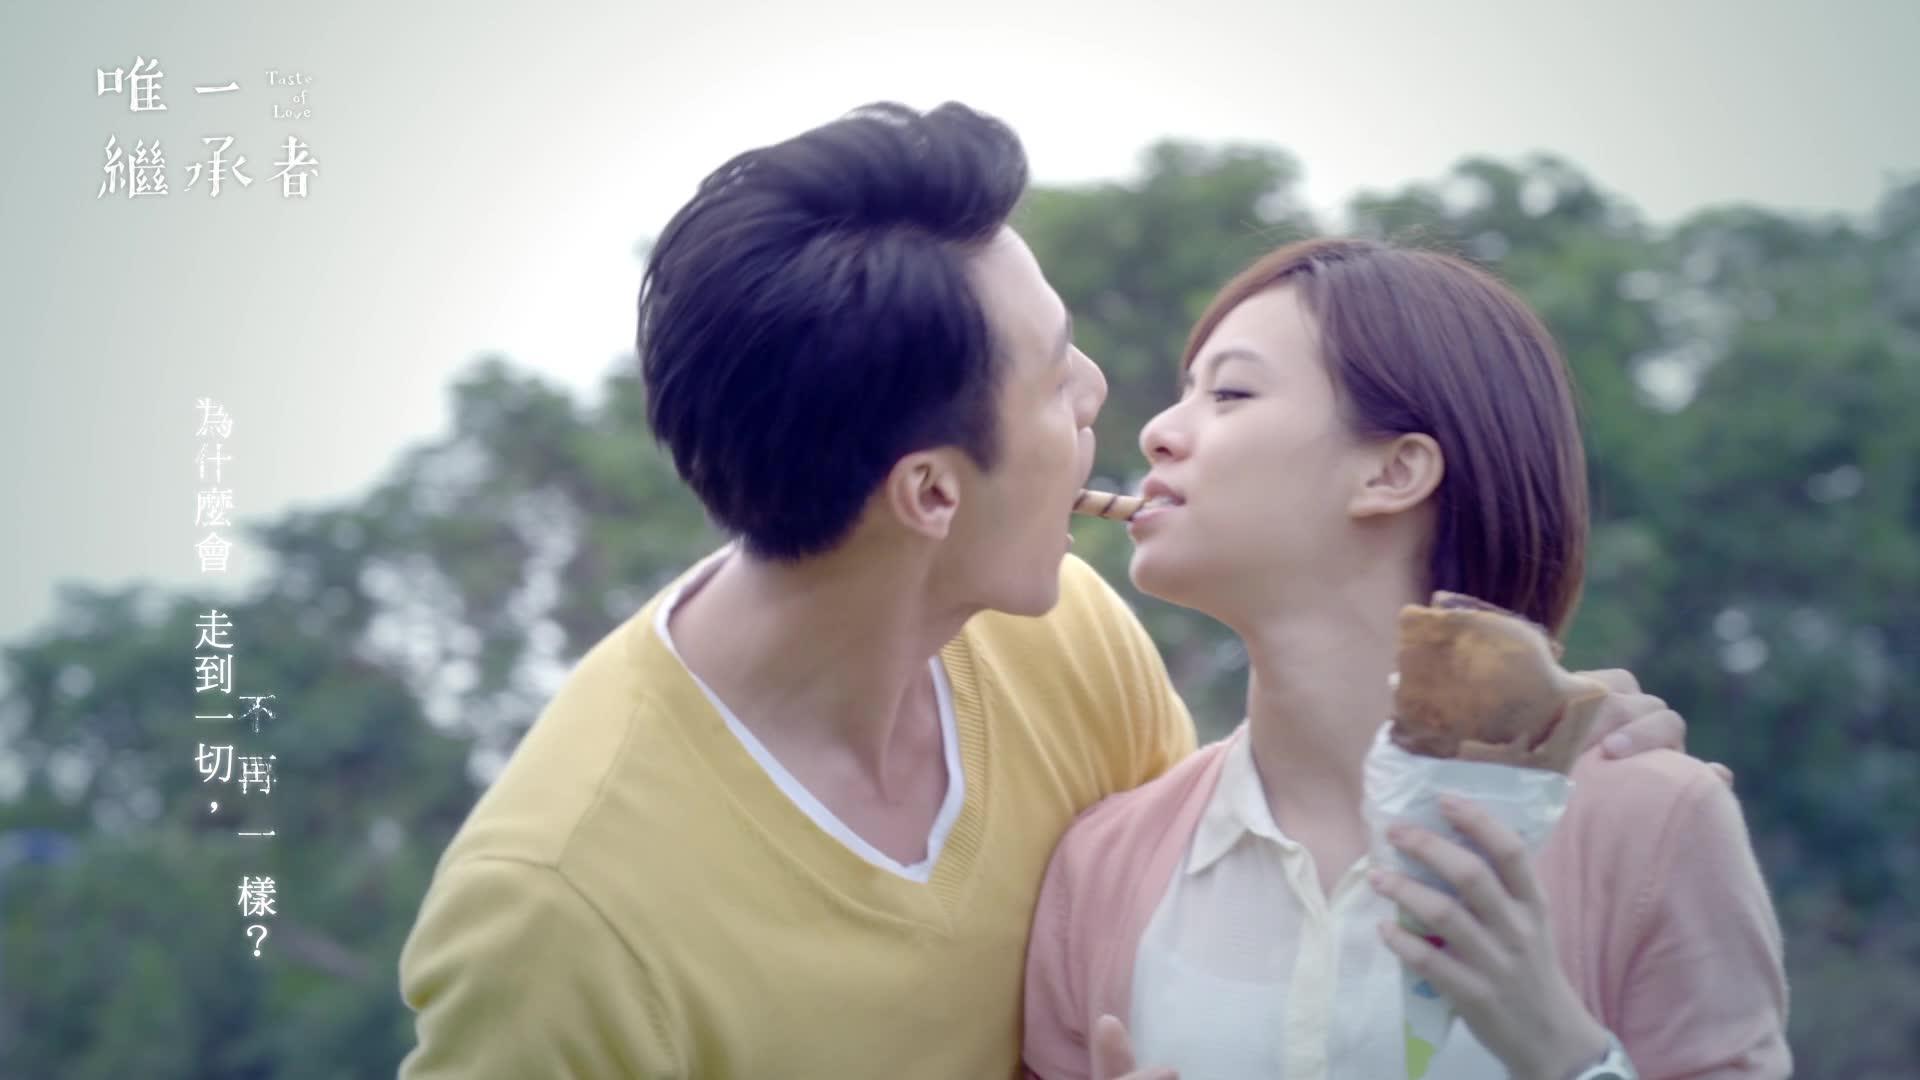 Taste of Love - 唯一繼承者 - Watch Full Episodes Free - Taiwan - TV